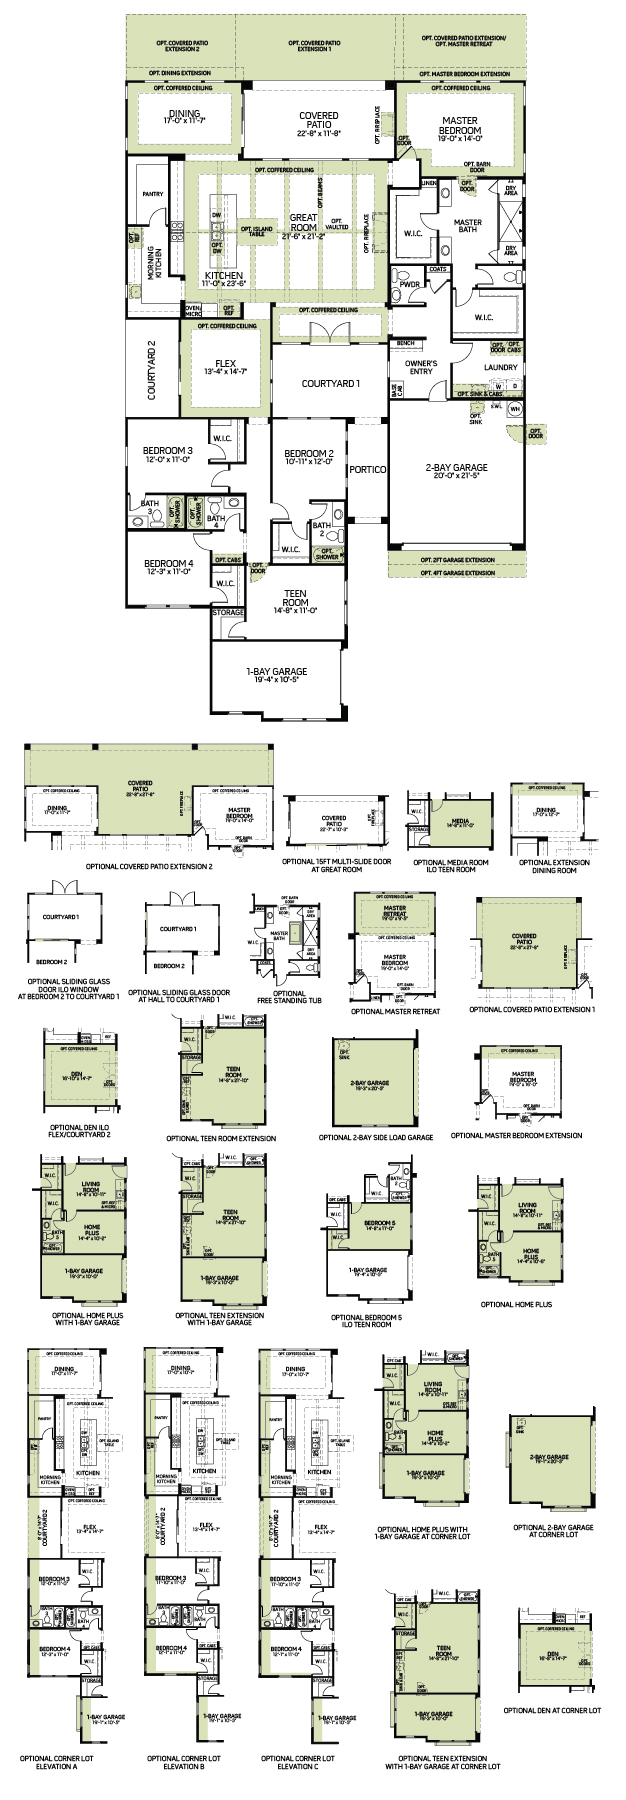 Style | Home+ Floorplan